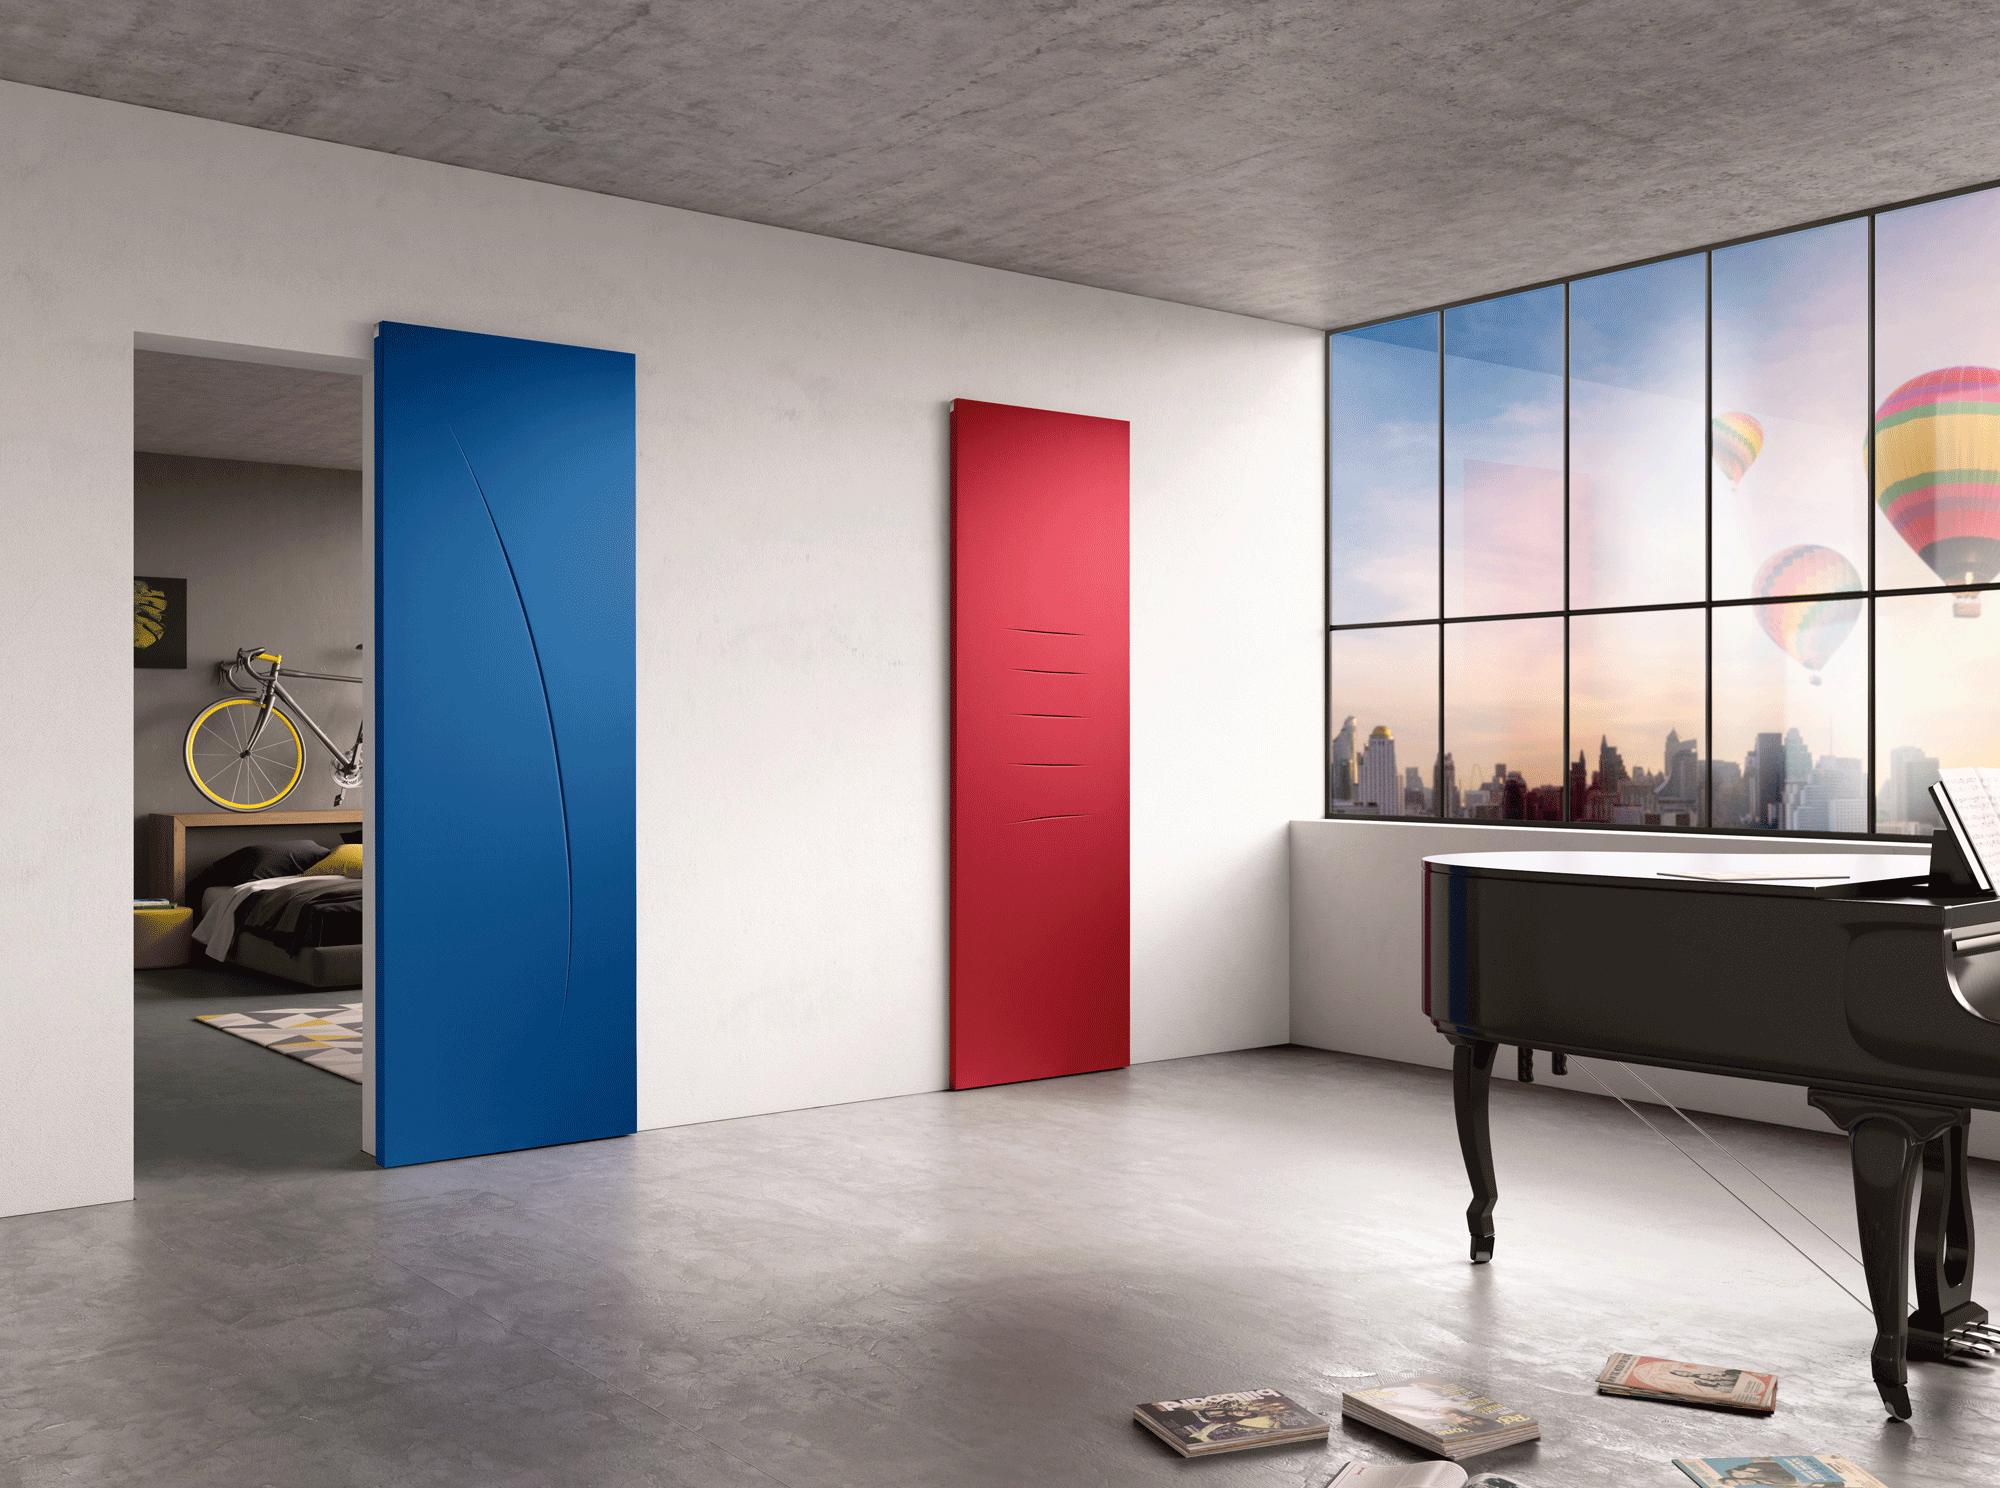 drzwi przesuwne color lucio30&lucio20 fila